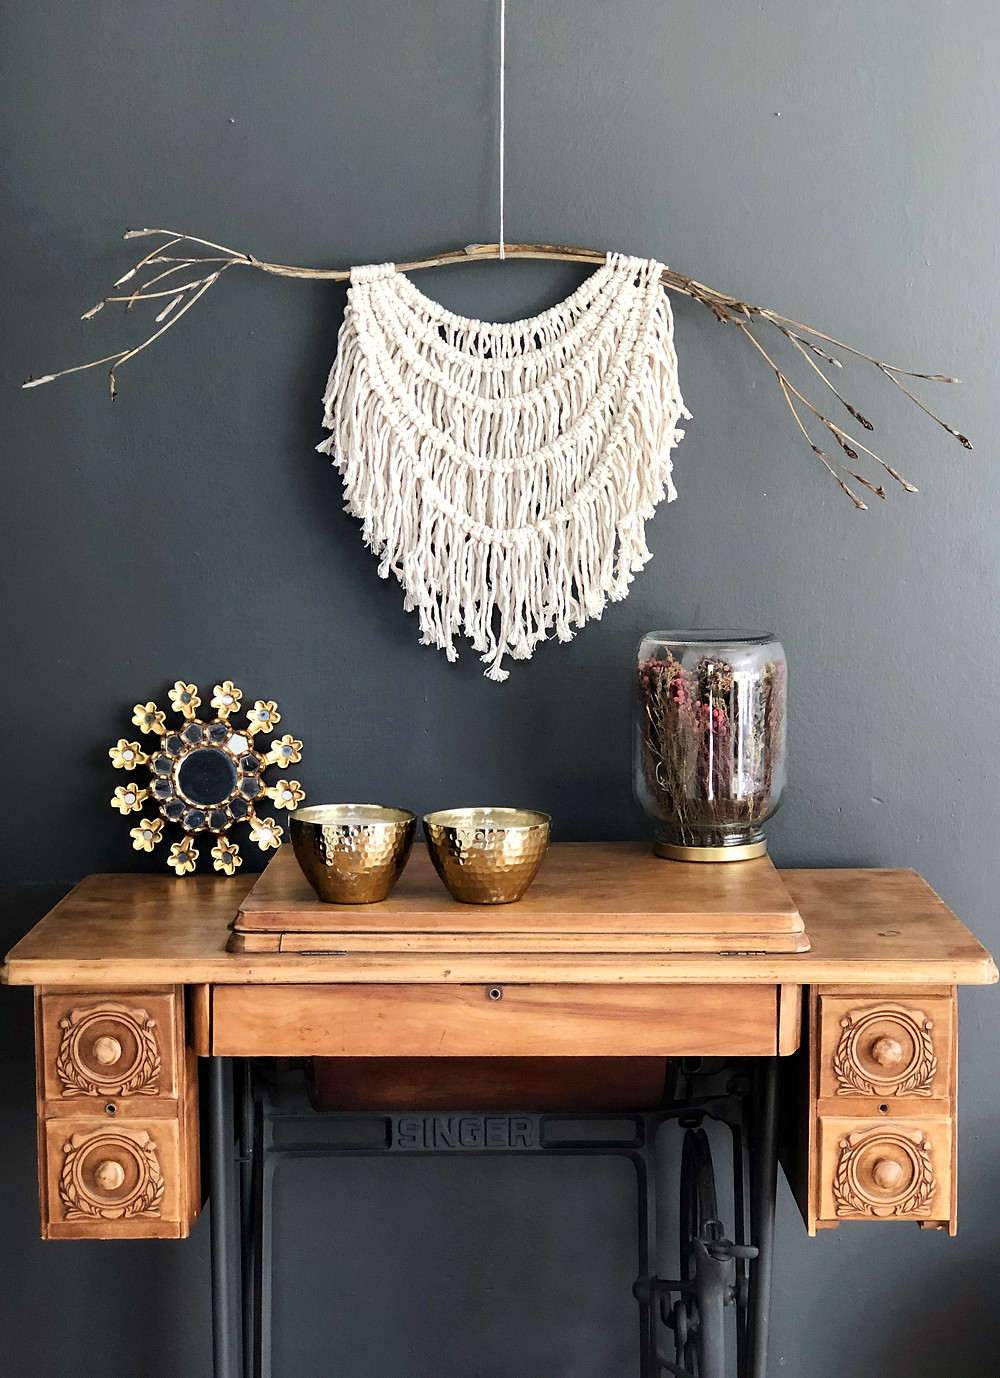 Macrame arte textil maquina de coser antigua pared gris